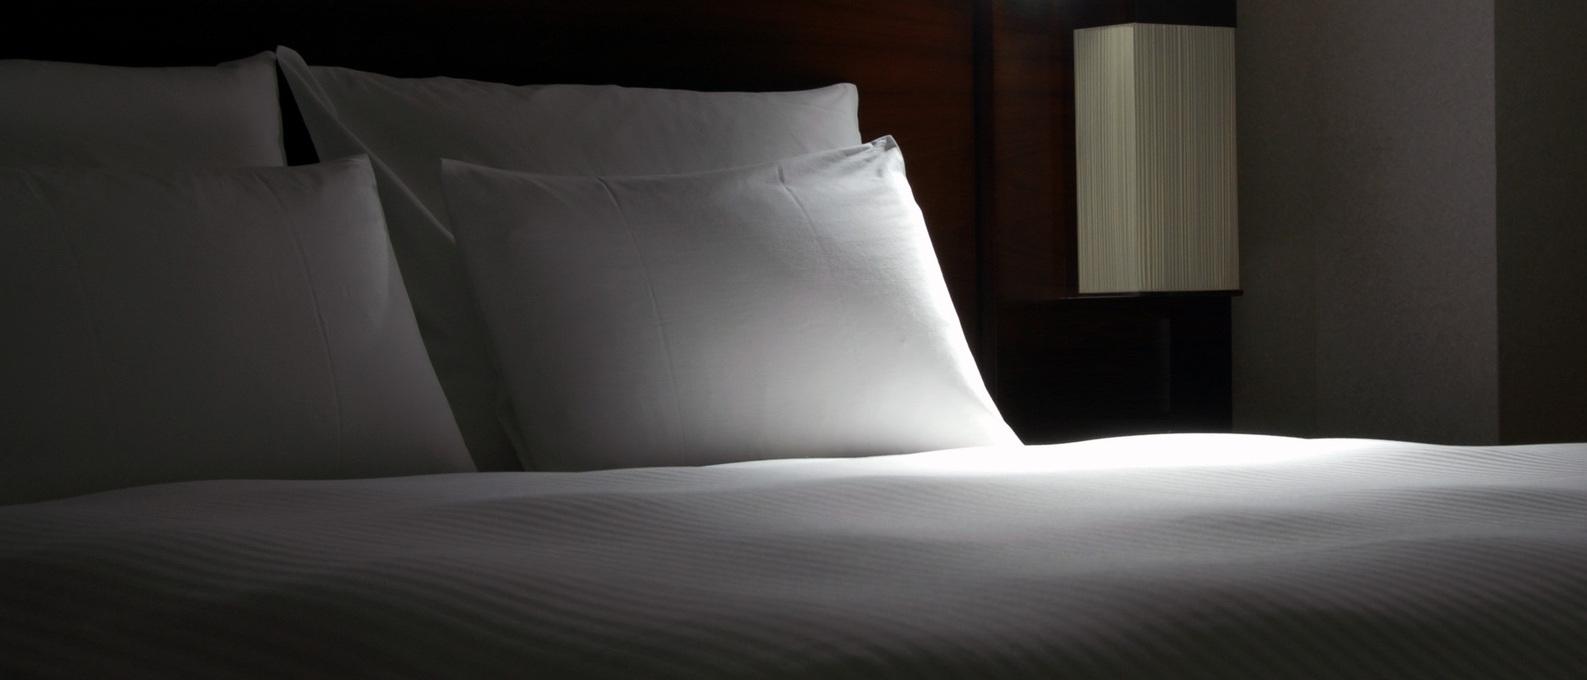 tokyo-hilton-bed-1223174-1598x1224